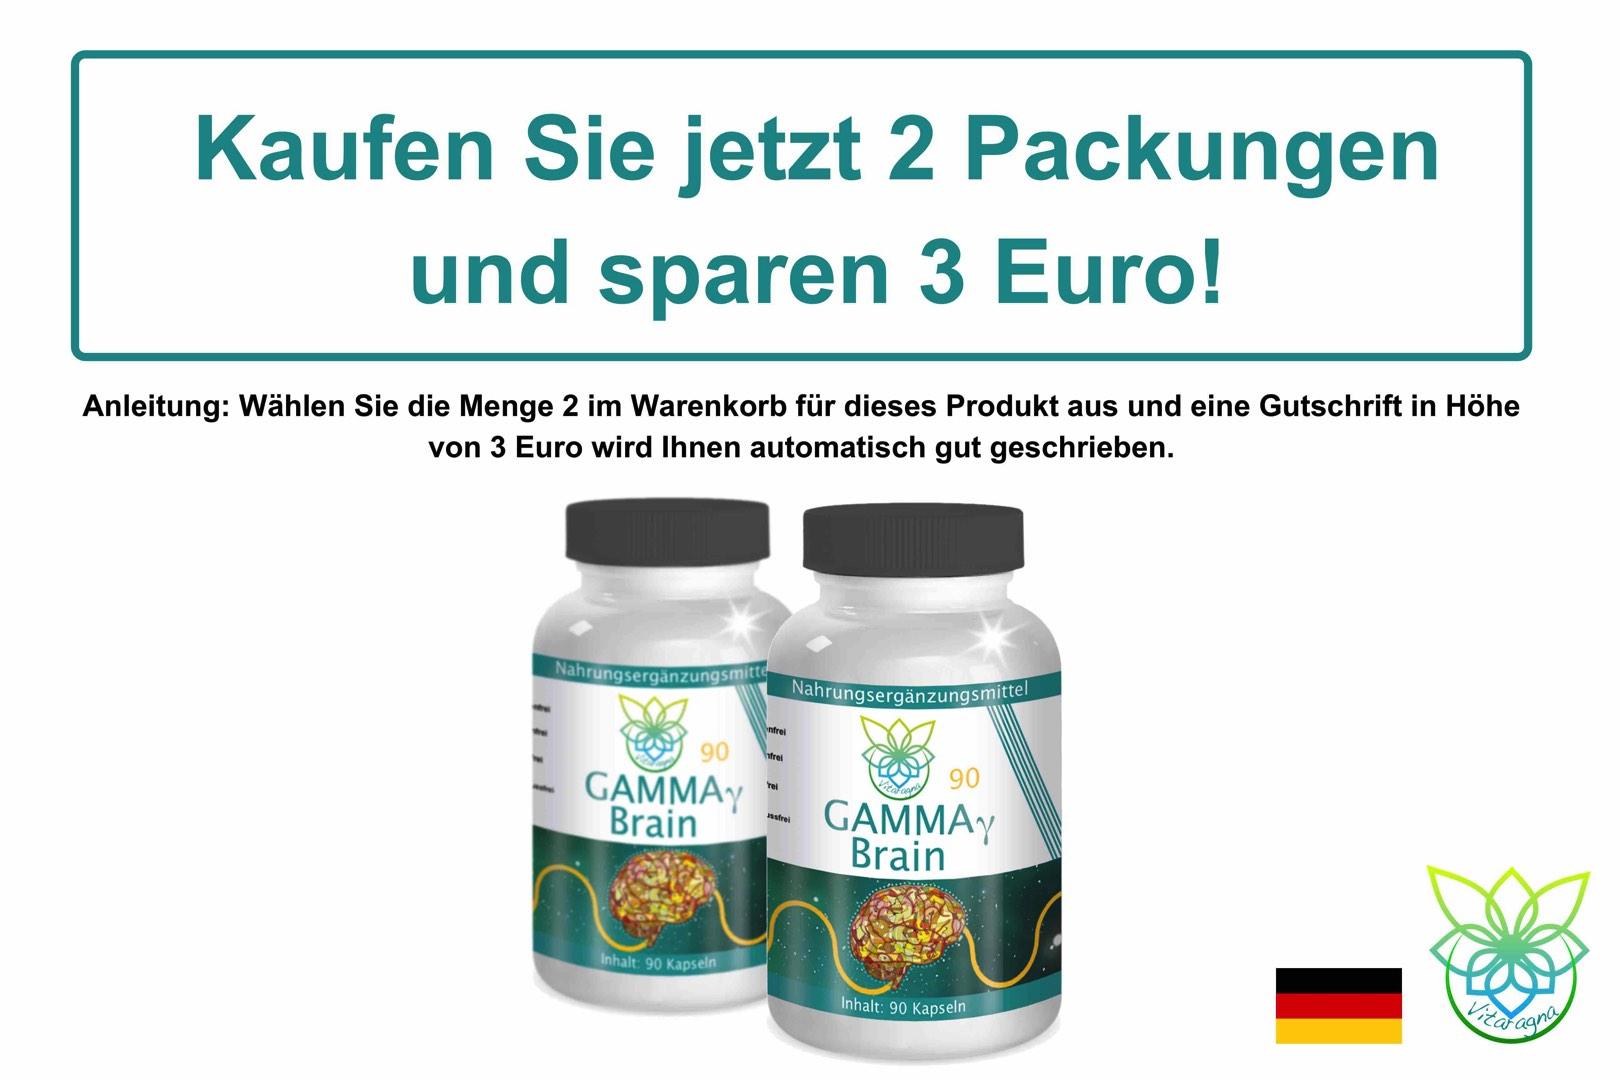 Gamma-Brain-Nootropika-Kapseln-Dose-Discount-2-Dosen-Freigestellt_small